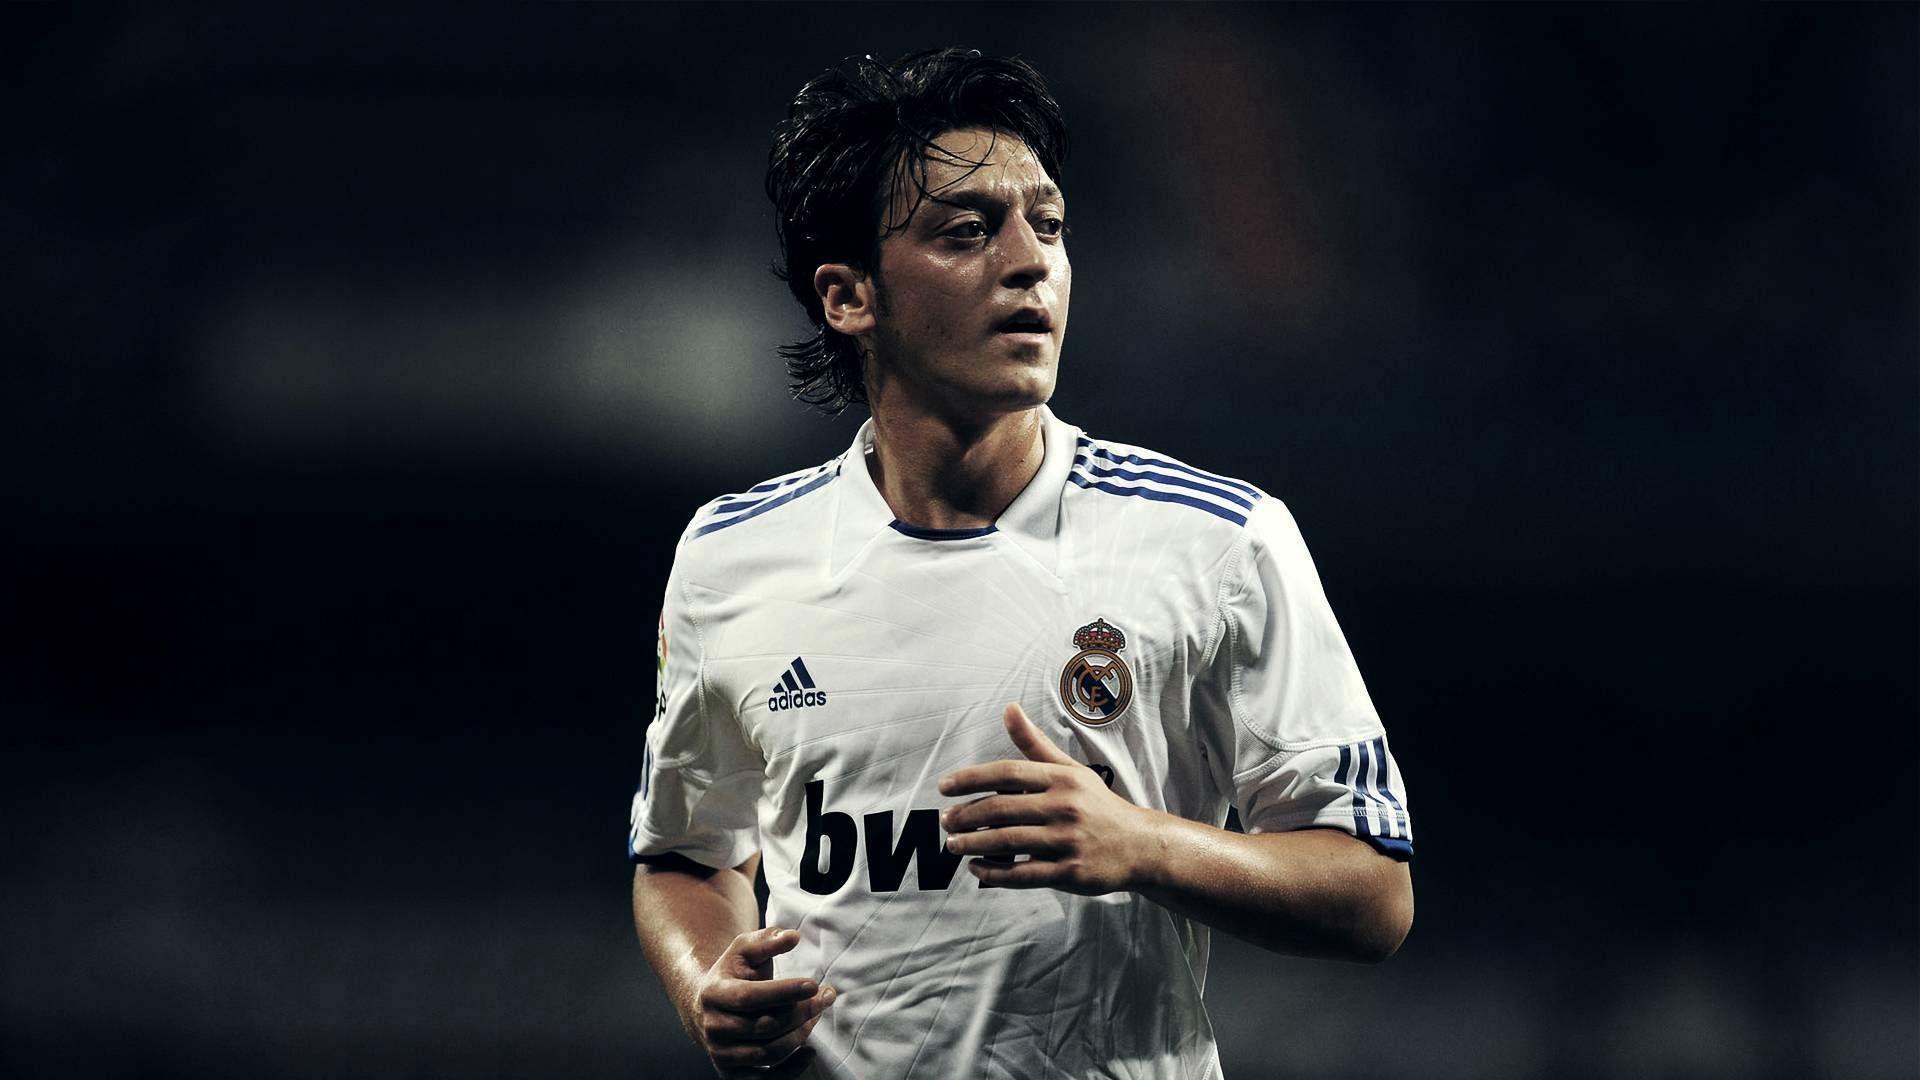 Mesut Ozil Real Madrid Hd Wallpaper Olahraga